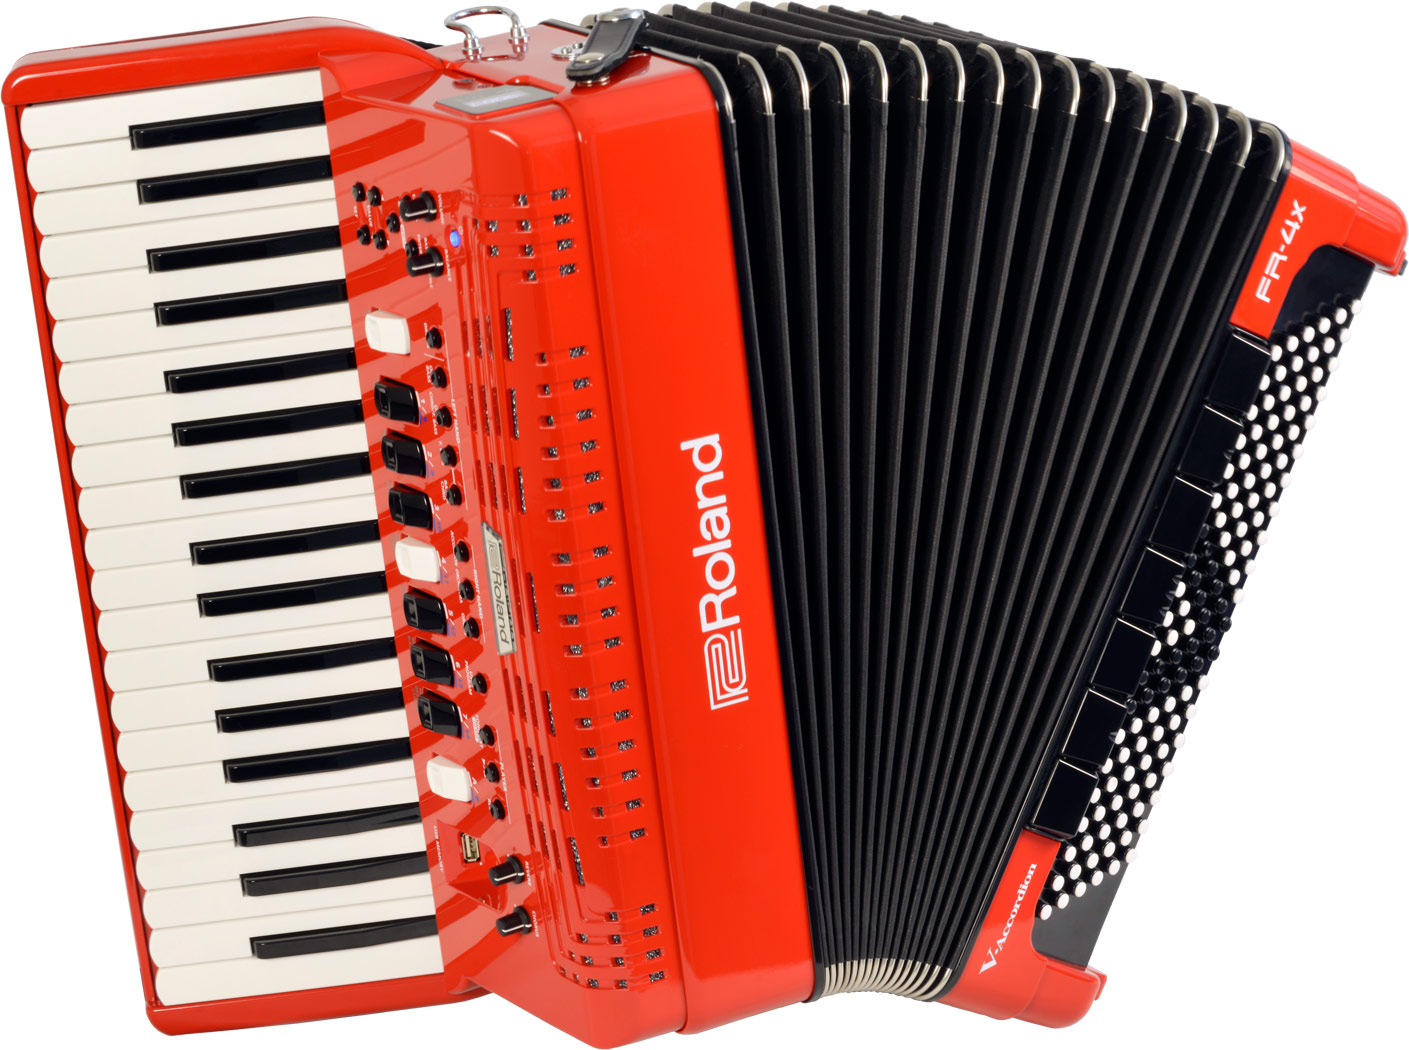 Fr 4x v accordion roland strumenti musicali marino baldacci